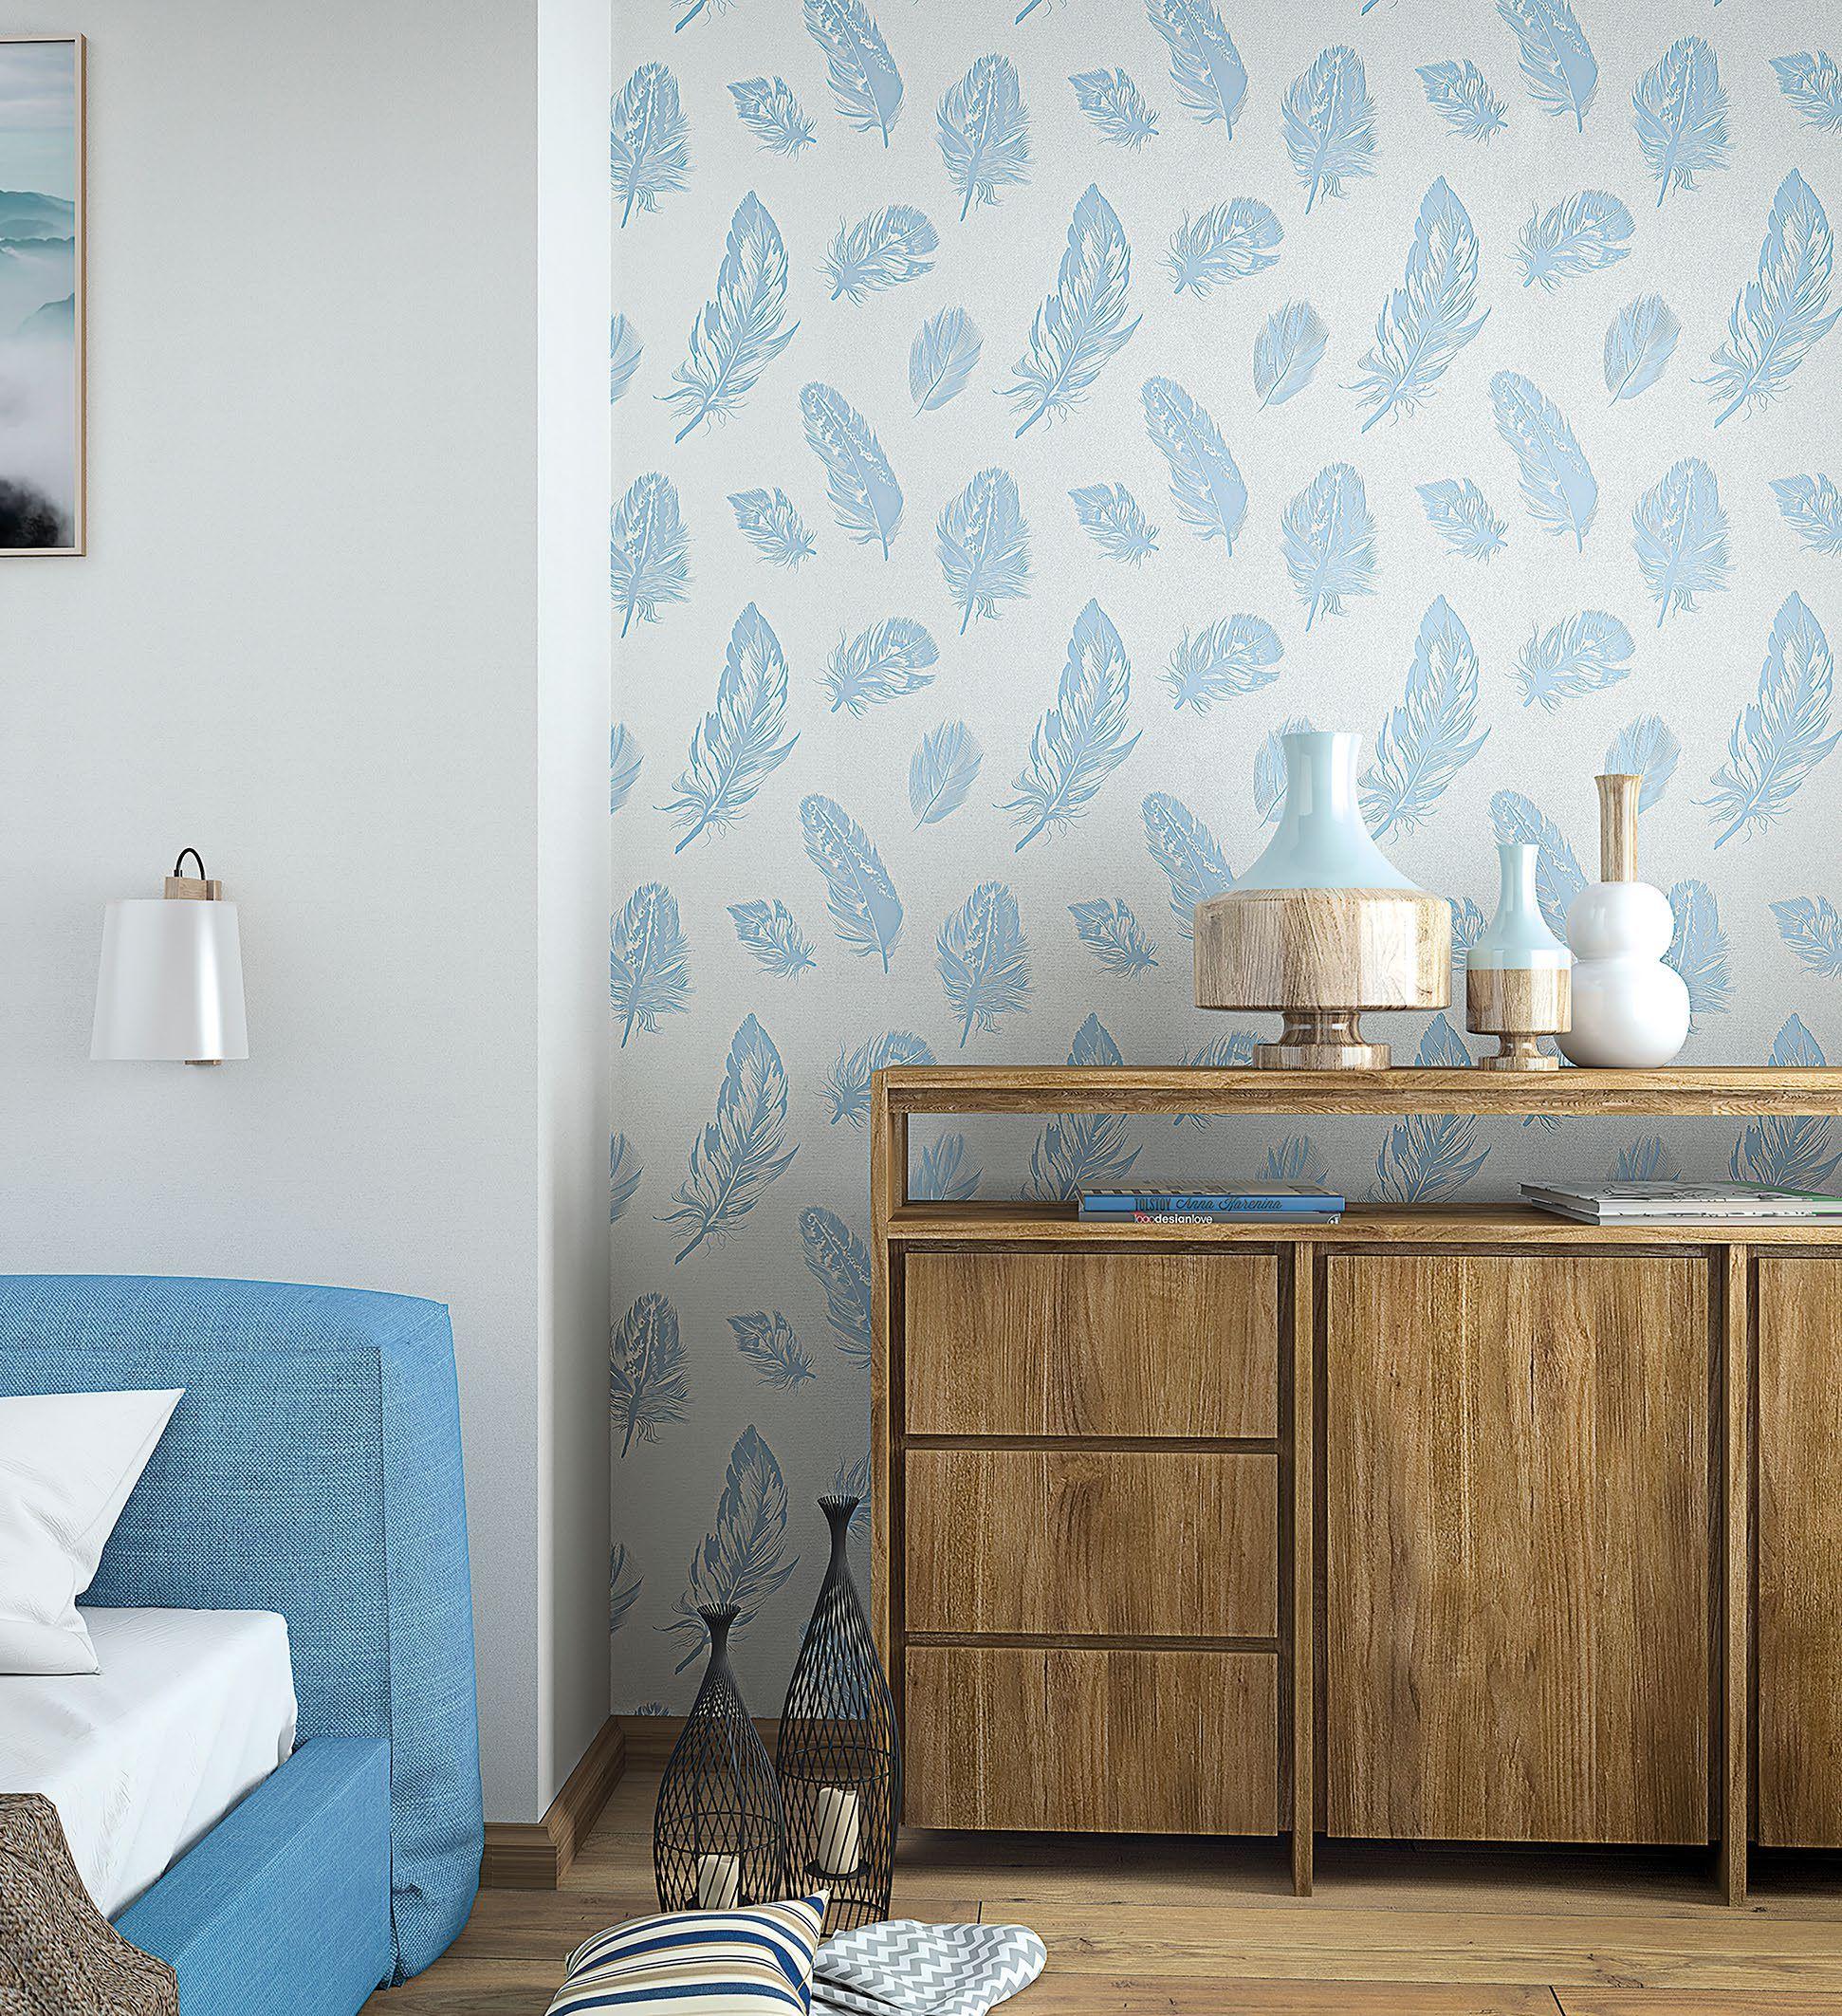 Asian Paints Nilaya April 2020 Wallpaper Designs For Walls Living Room Decor Modern Shelf Decorating Living Room